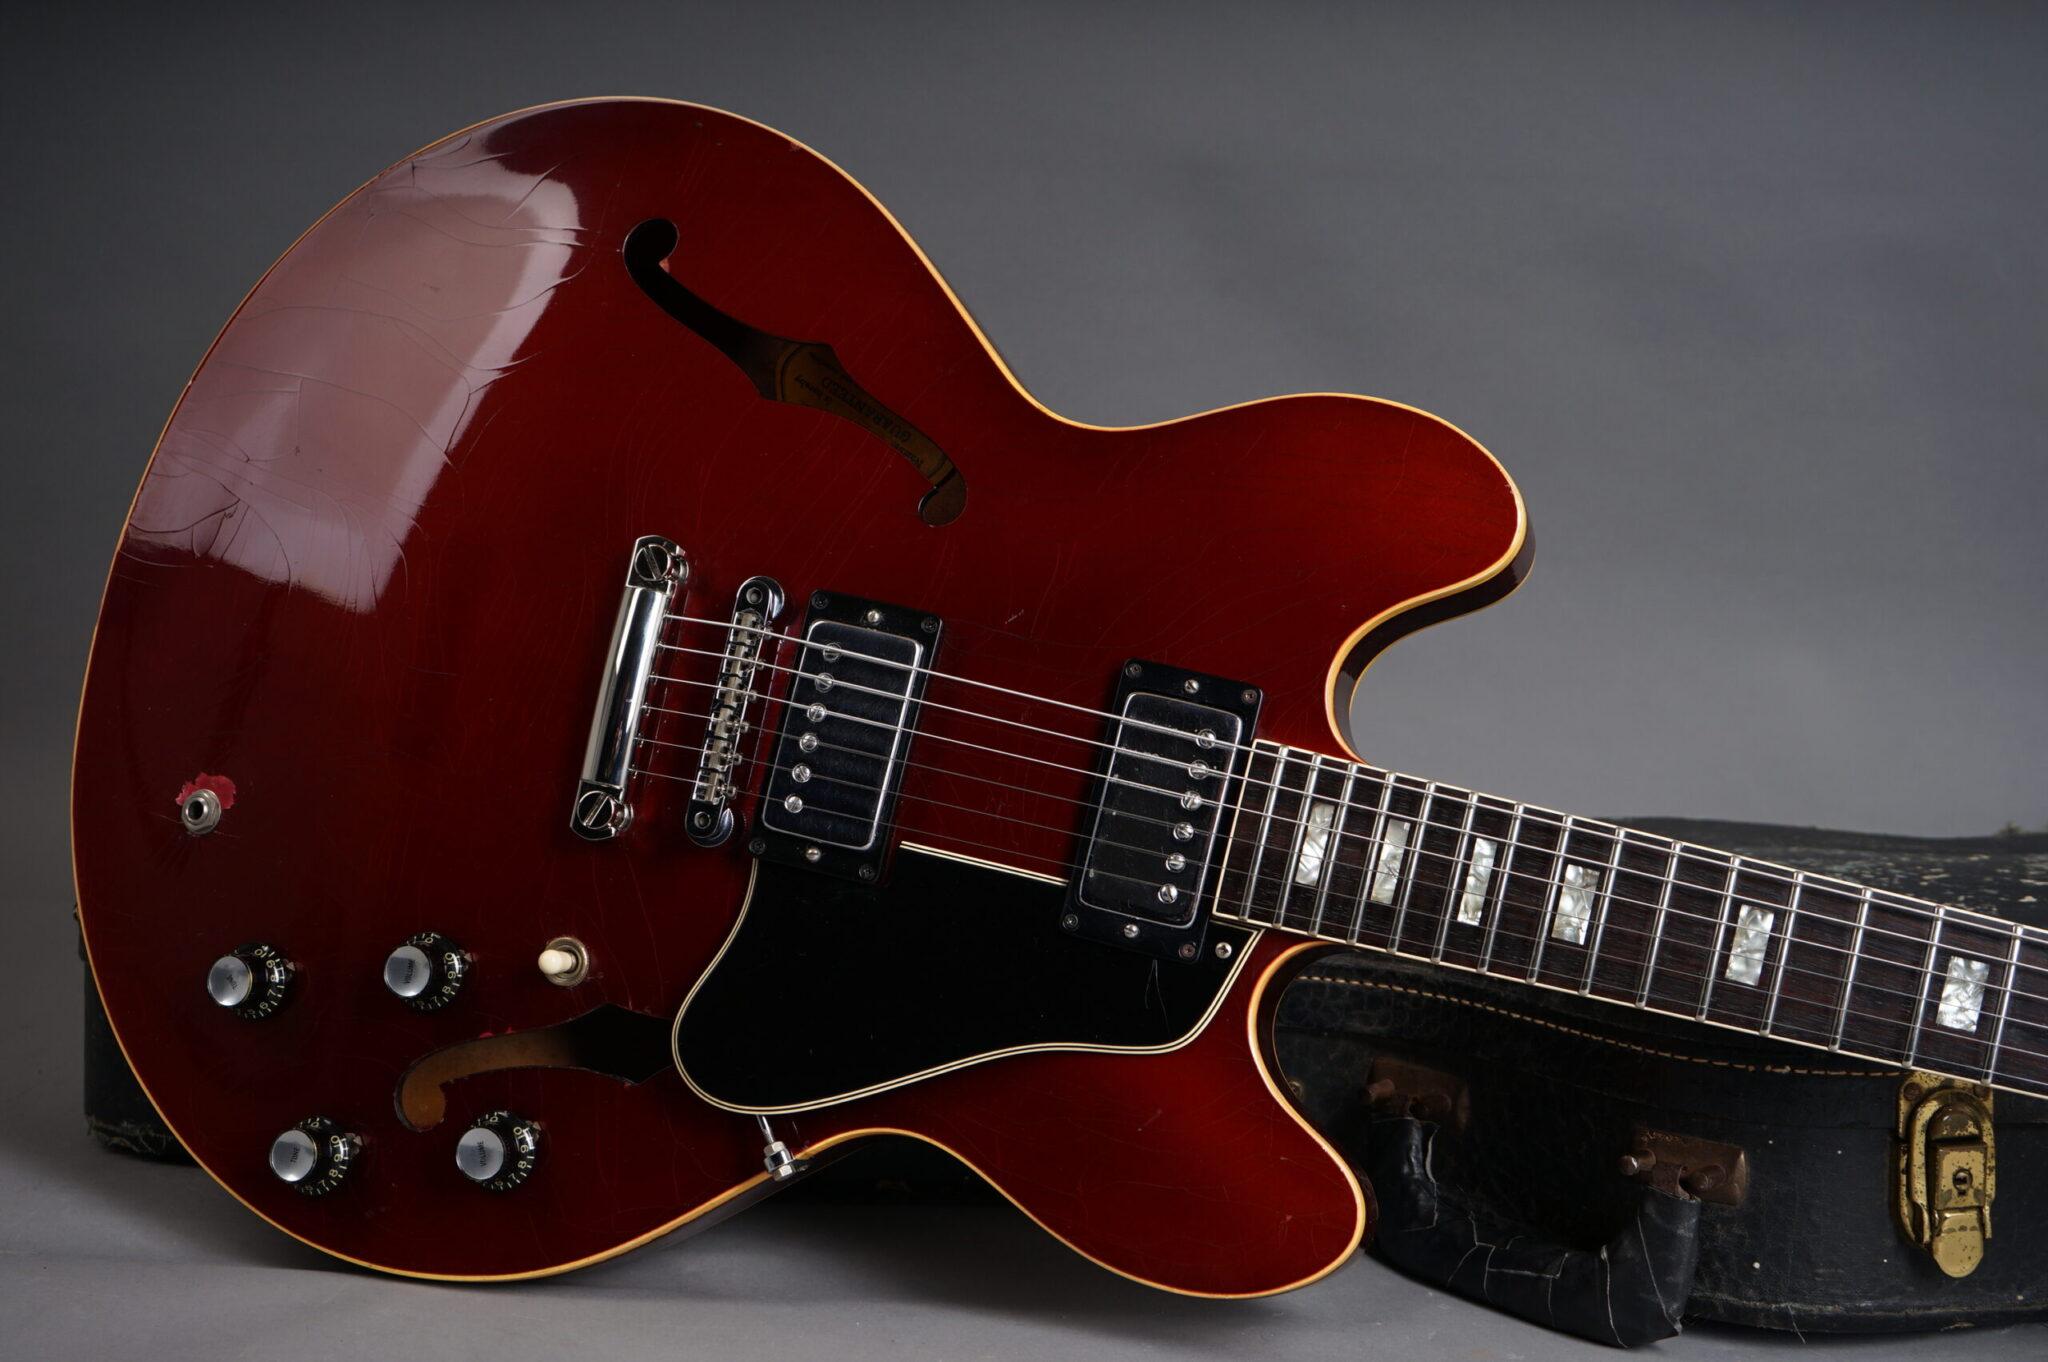 https://guitarpoint.de/app/uploads/products/1967-gibson-es-335-td-burgundy-metallic-stoptail-conversion/1967-GIBSON-ES-335-Burgundy-897139-8-scaled-2048x1362.jpg